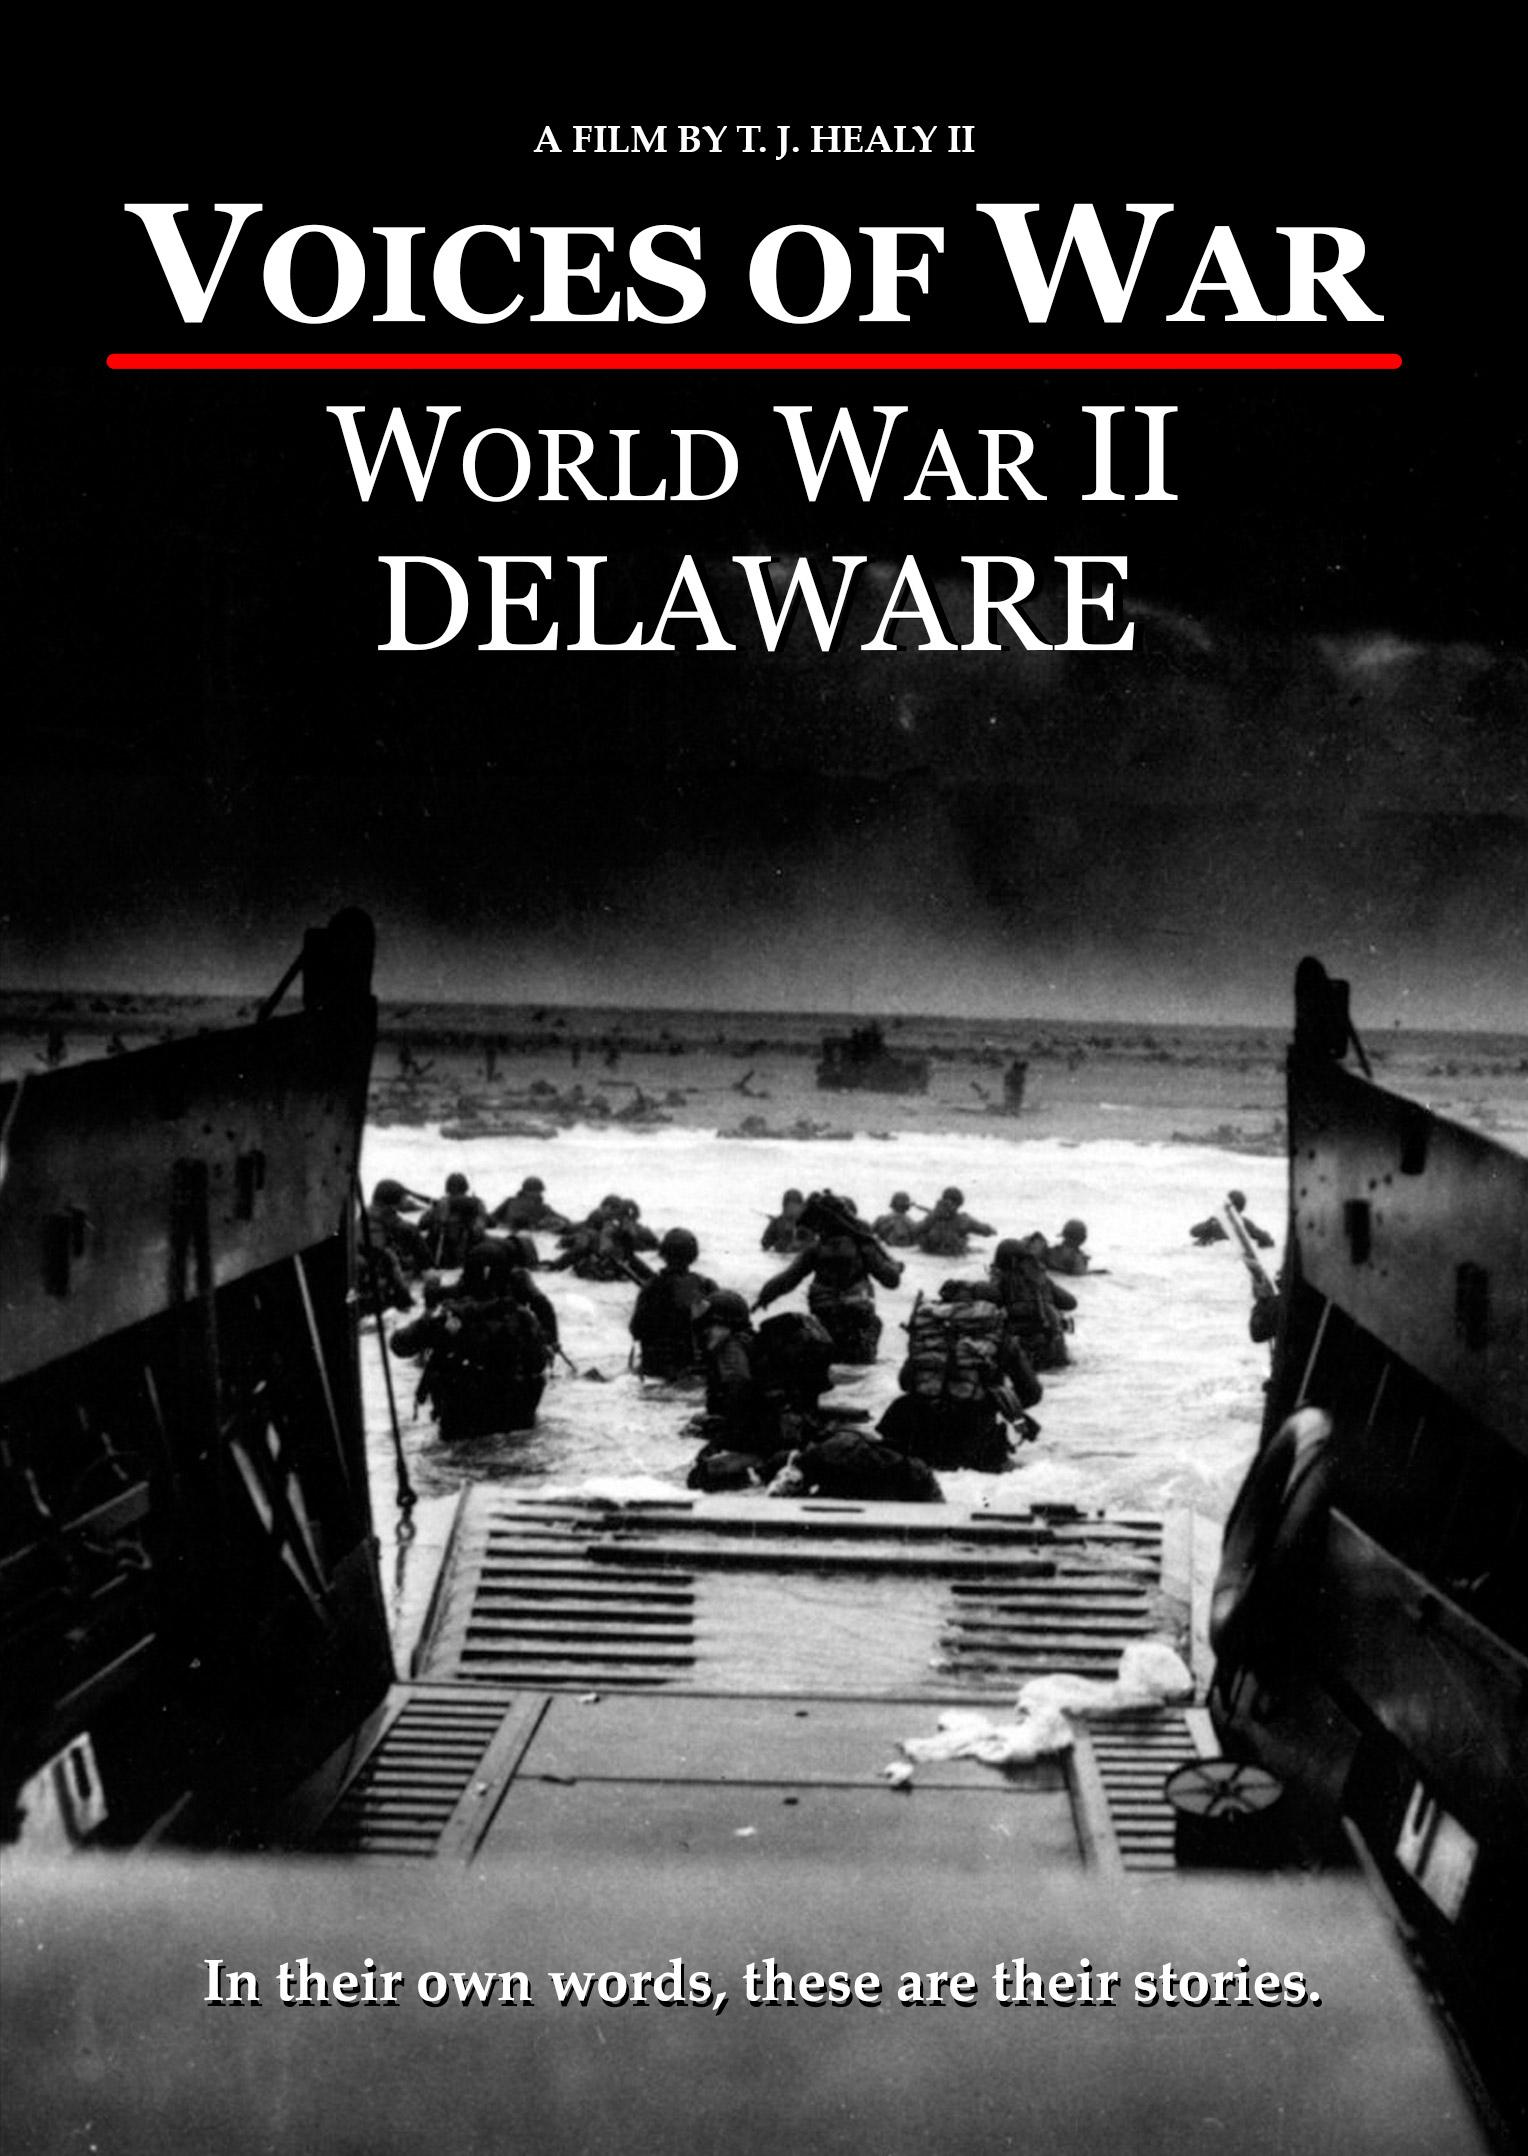 Voices of War World War II